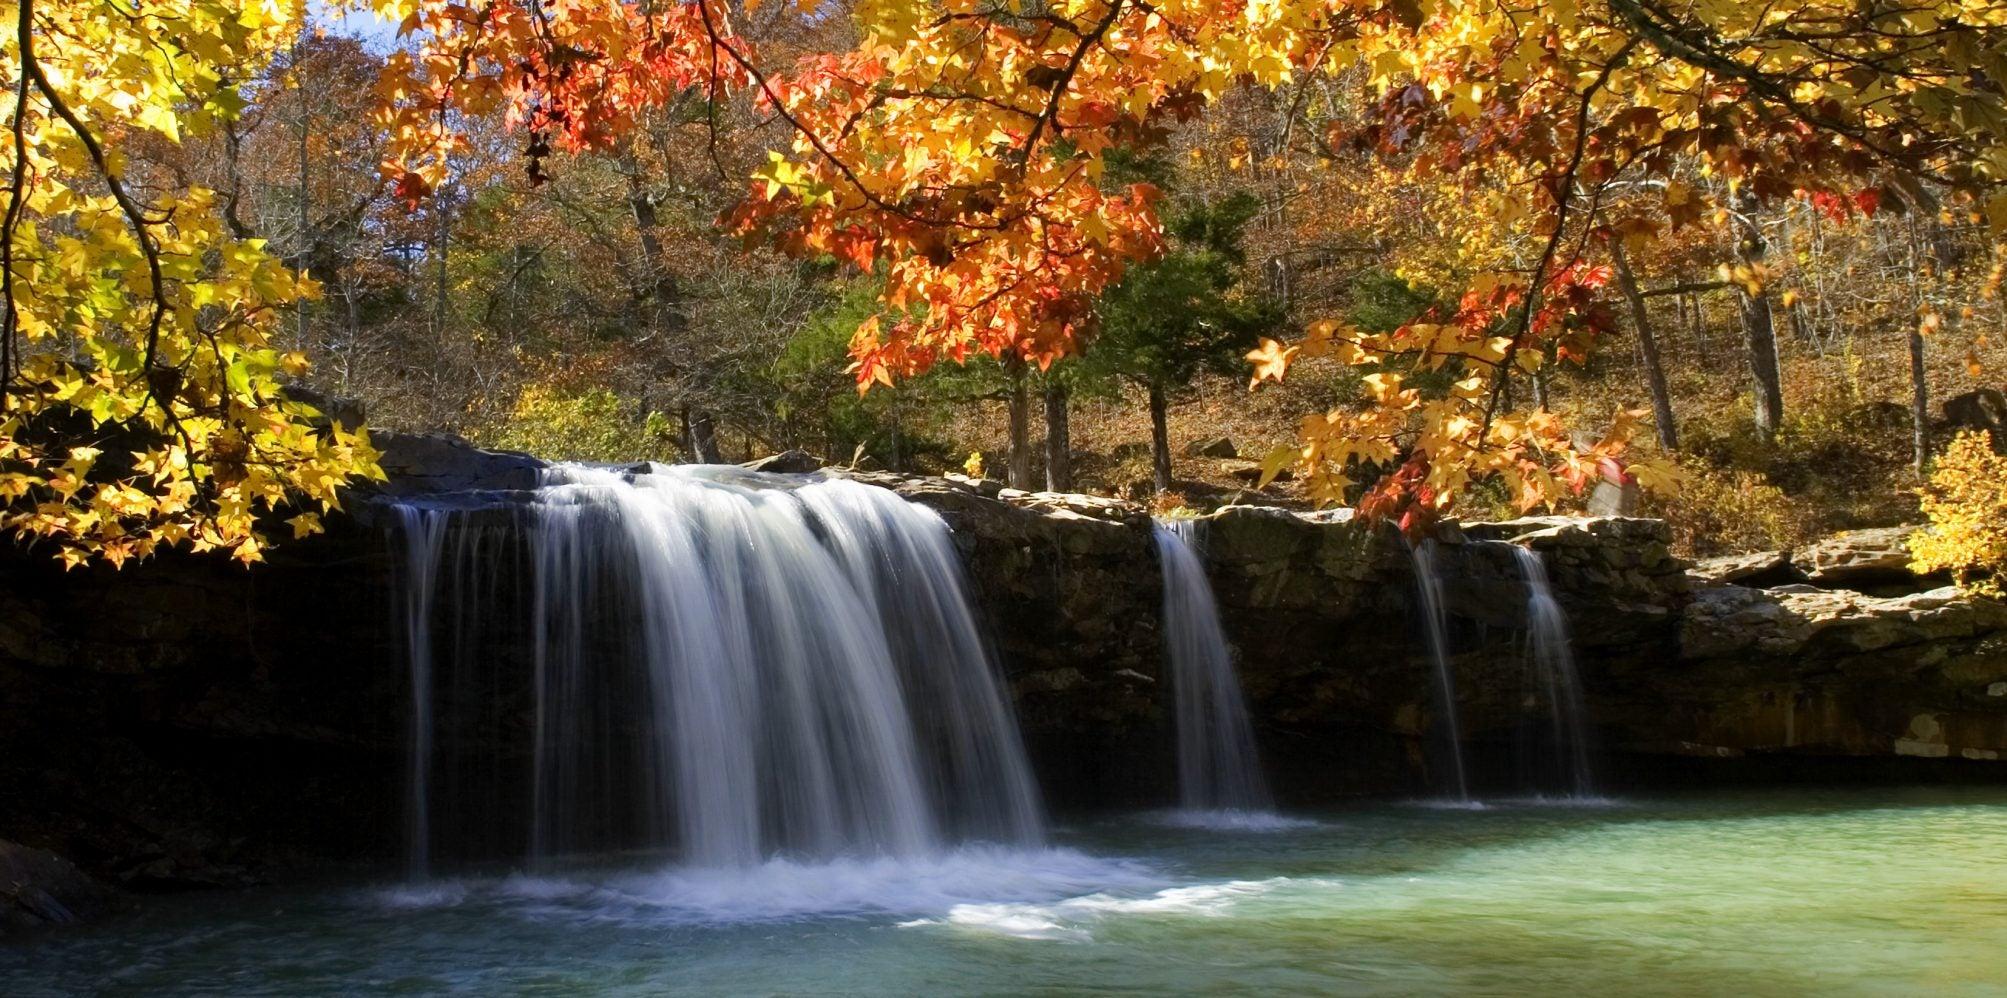 ozark national forest autumn waterfall